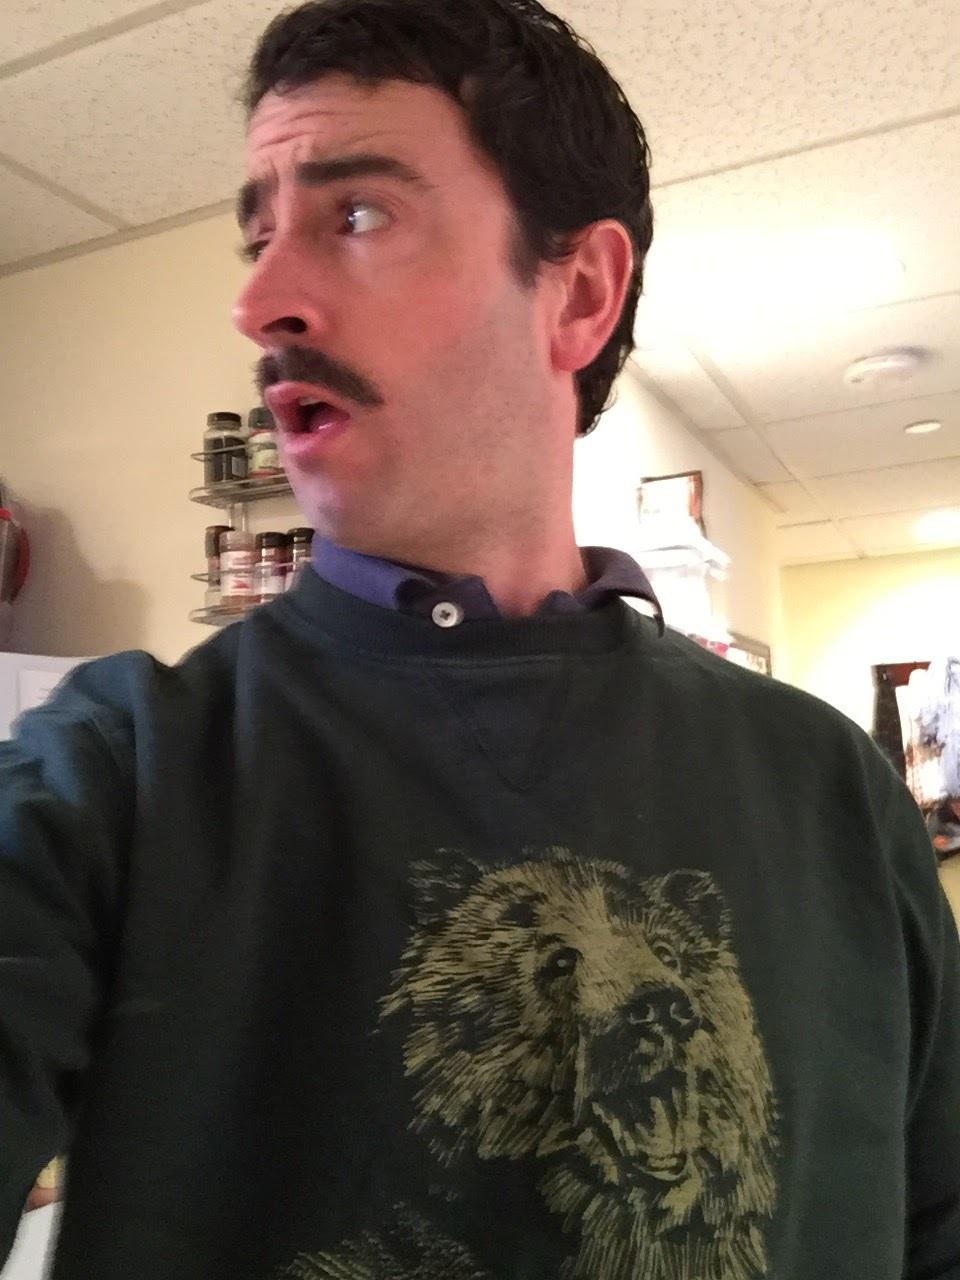 mustachebear